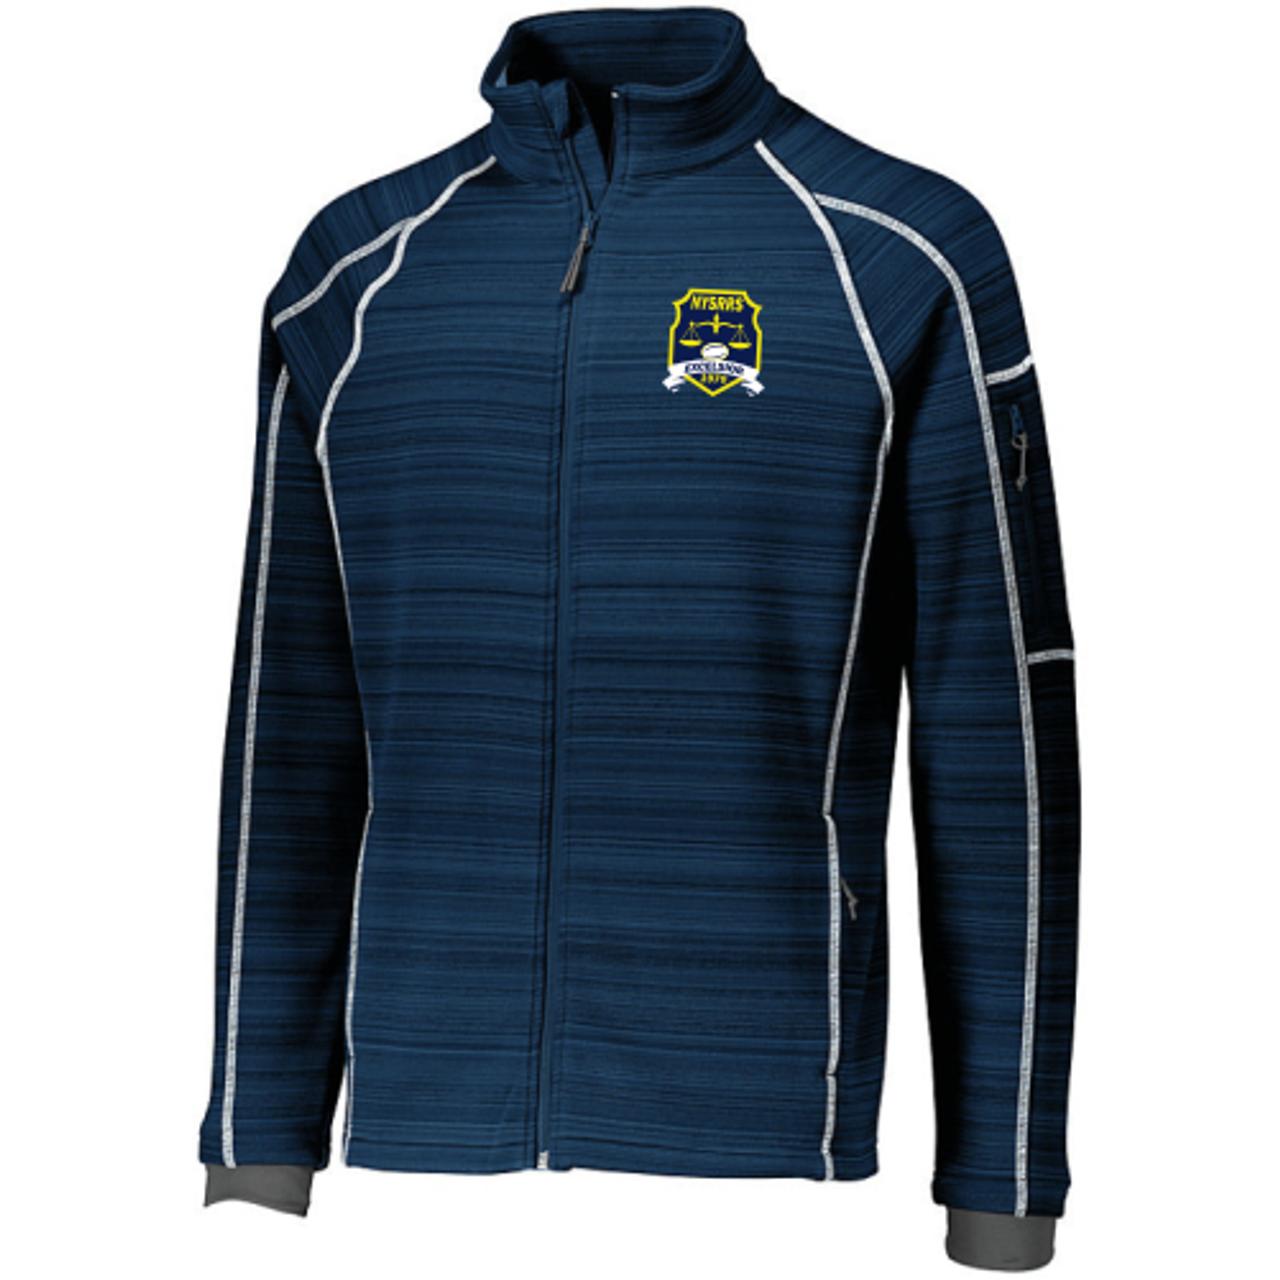 NYSRRS Poly Fleece Jacket